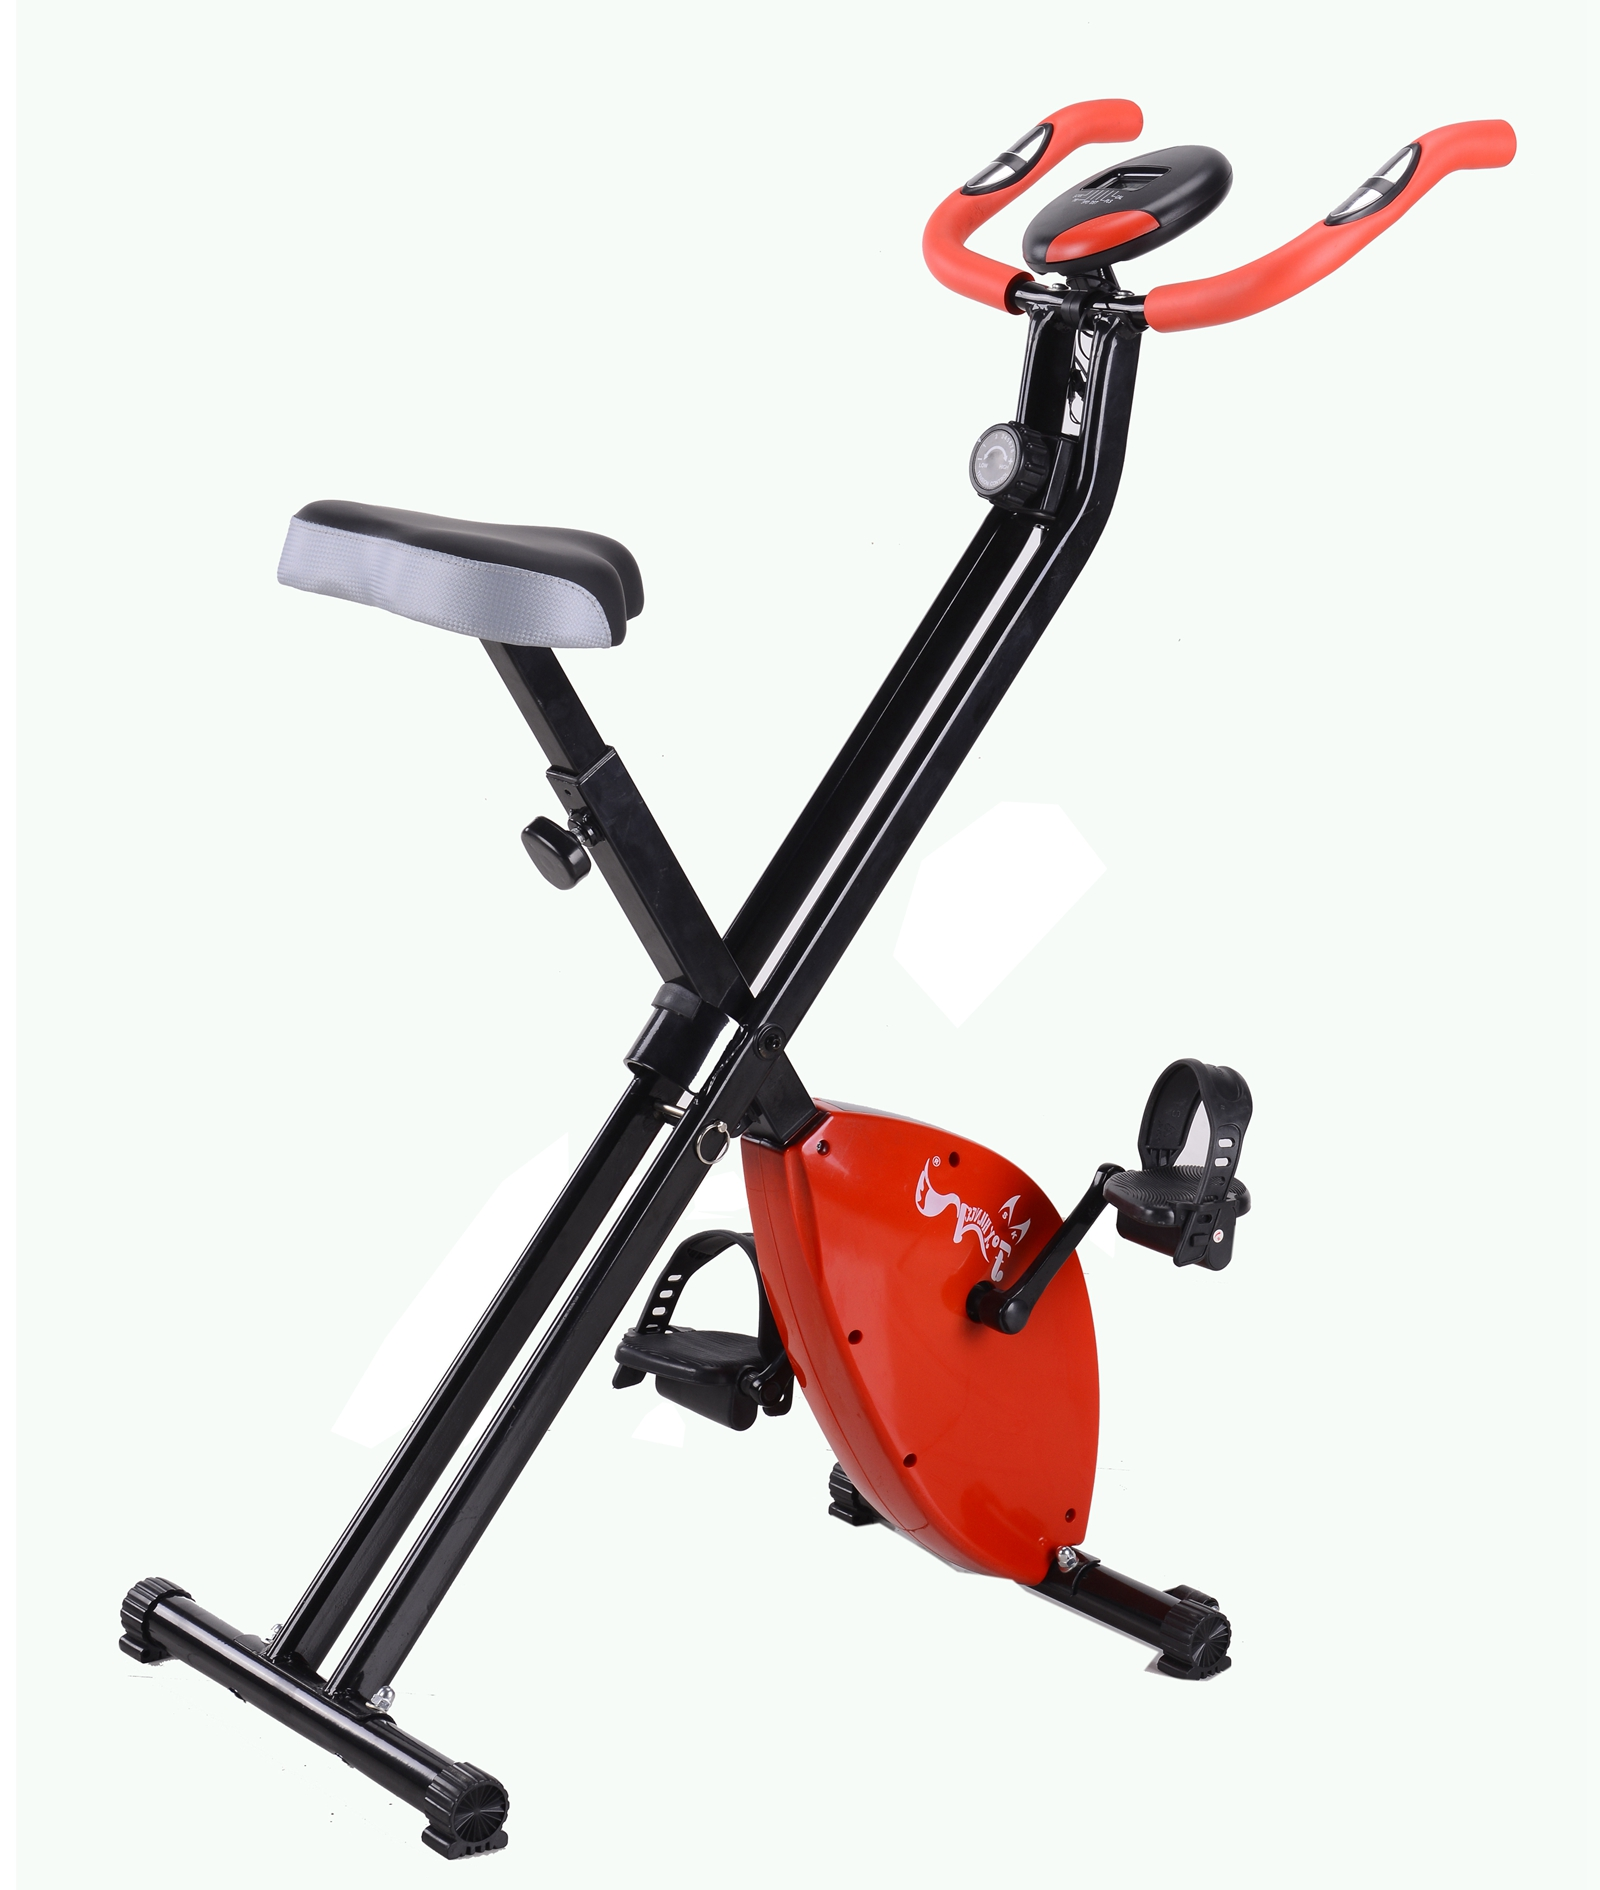 nouvel exercice red v lo pliant magn tique x bike fitness workout io perte de poids. Black Bedroom Furniture Sets. Home Design Ideas